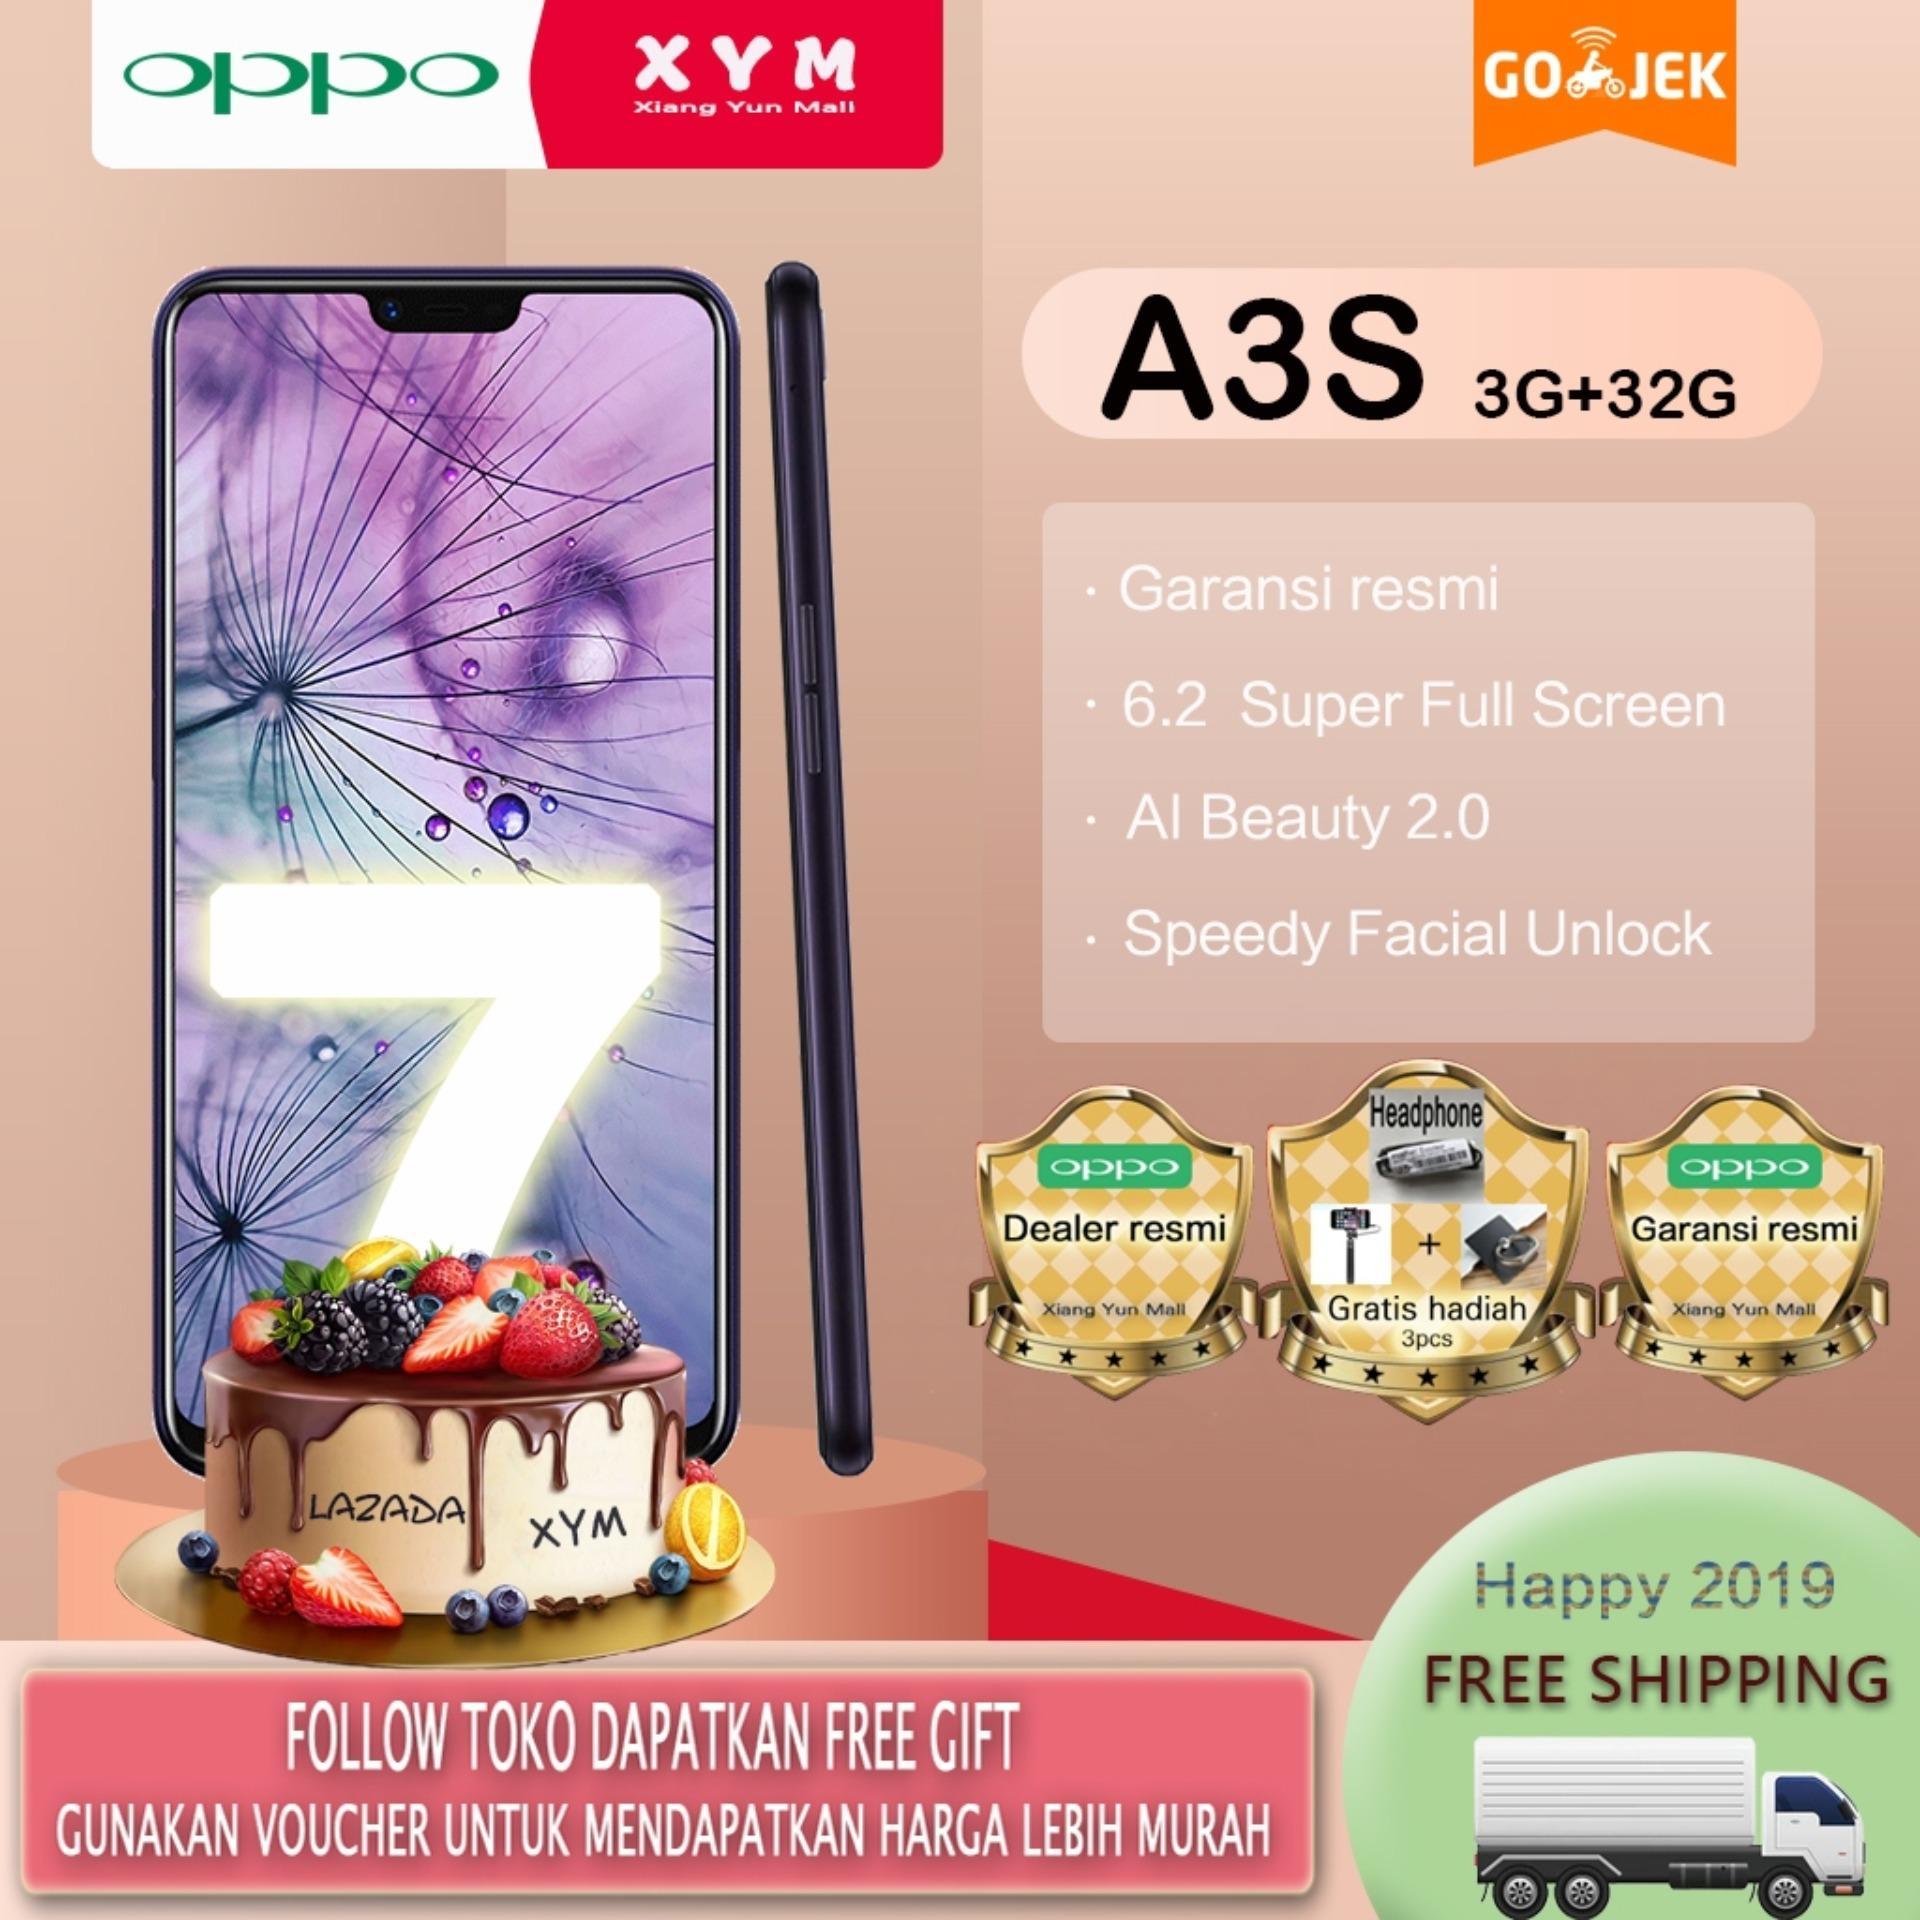 OPPO A3s hp 3G/32G - COD, Gratis Ongkir, 6.2 Super Full Screen, Speedy Facial Unlock, Garansi resmi [ Please use the voucher ]